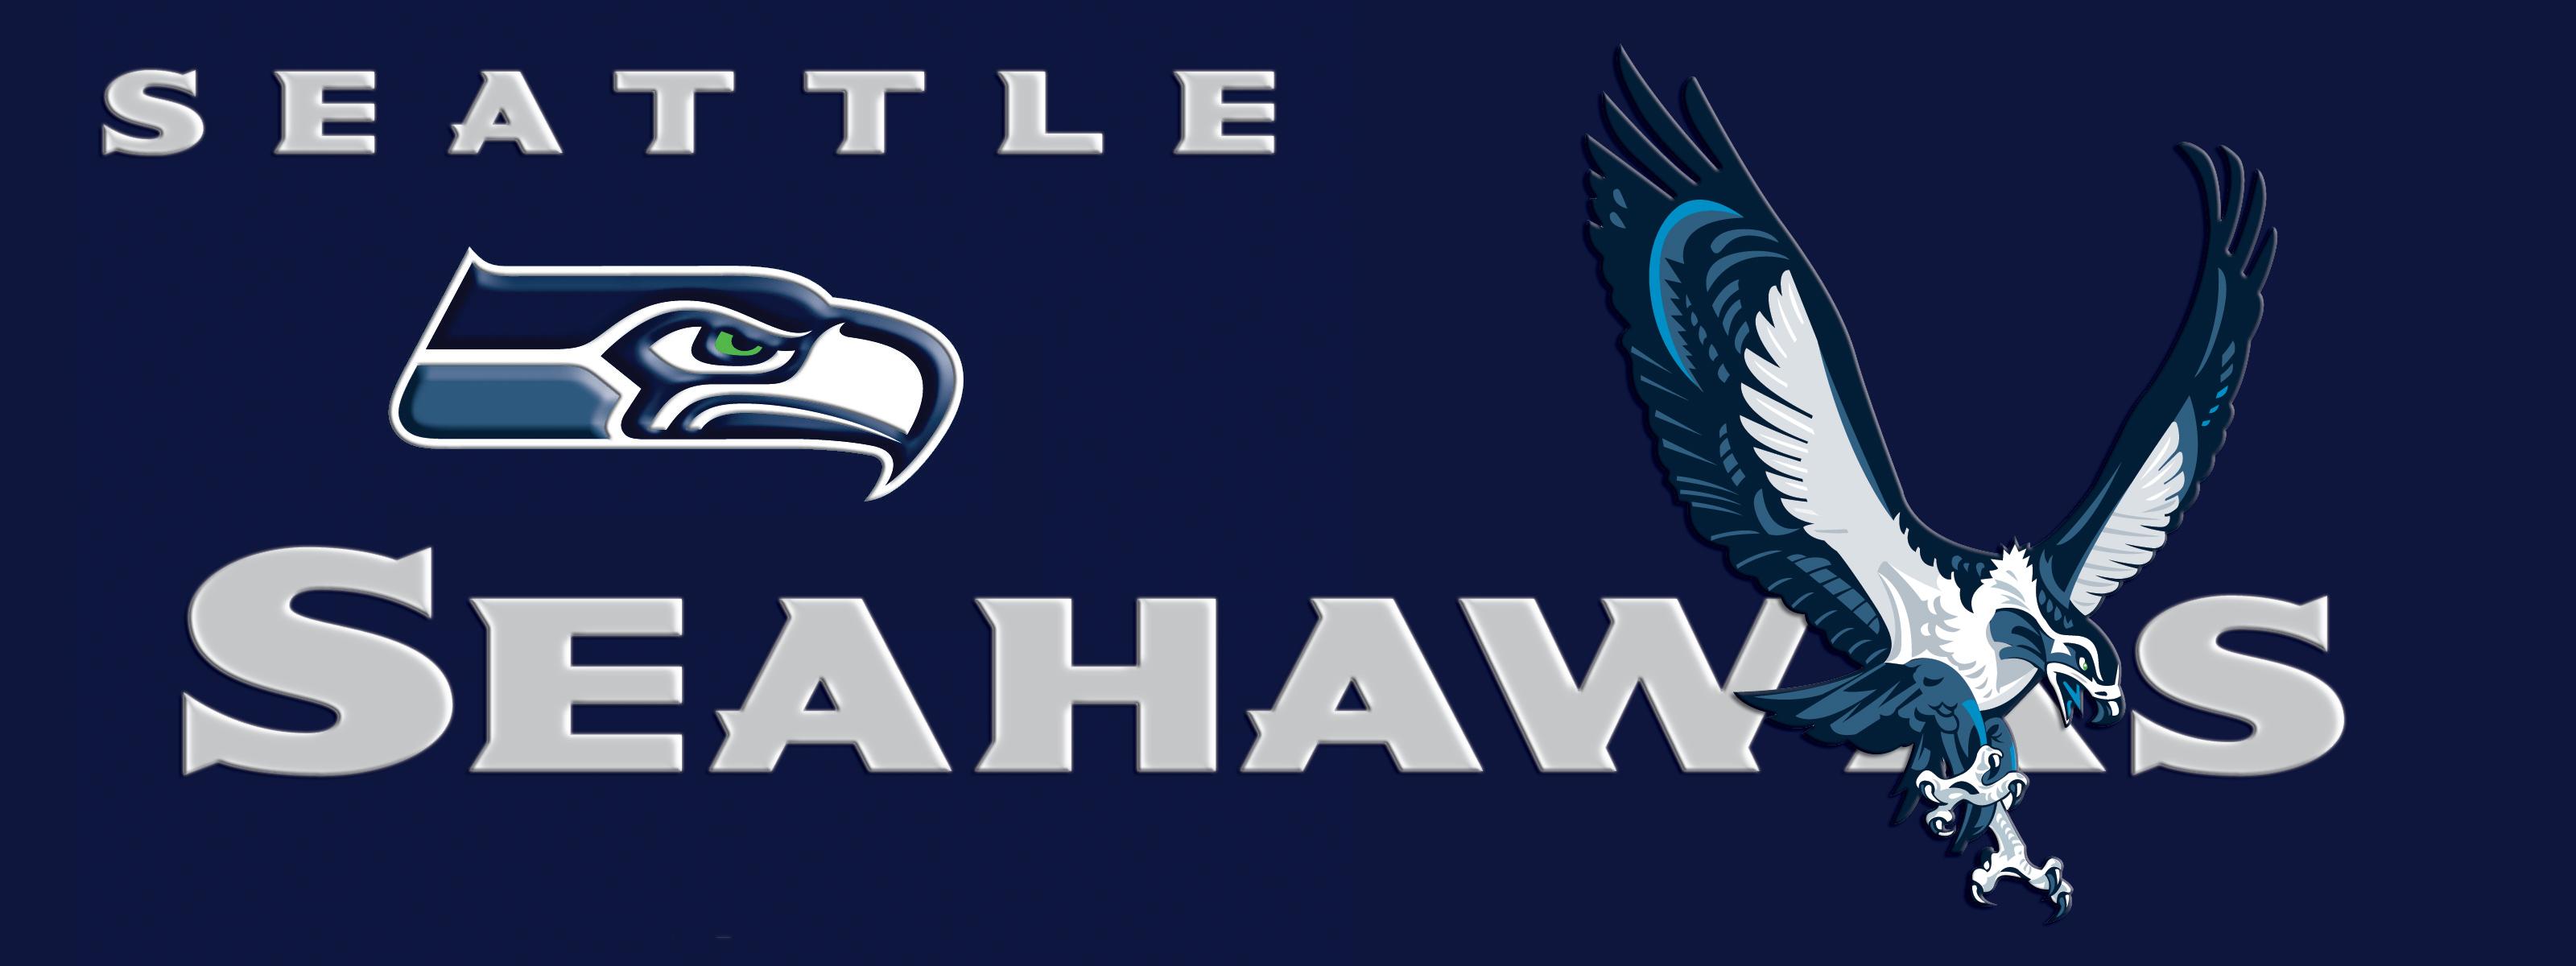 Seattle Seahawks Nfl Football Sport P Wallpaper 3200x1200 82460 Wallpaperup